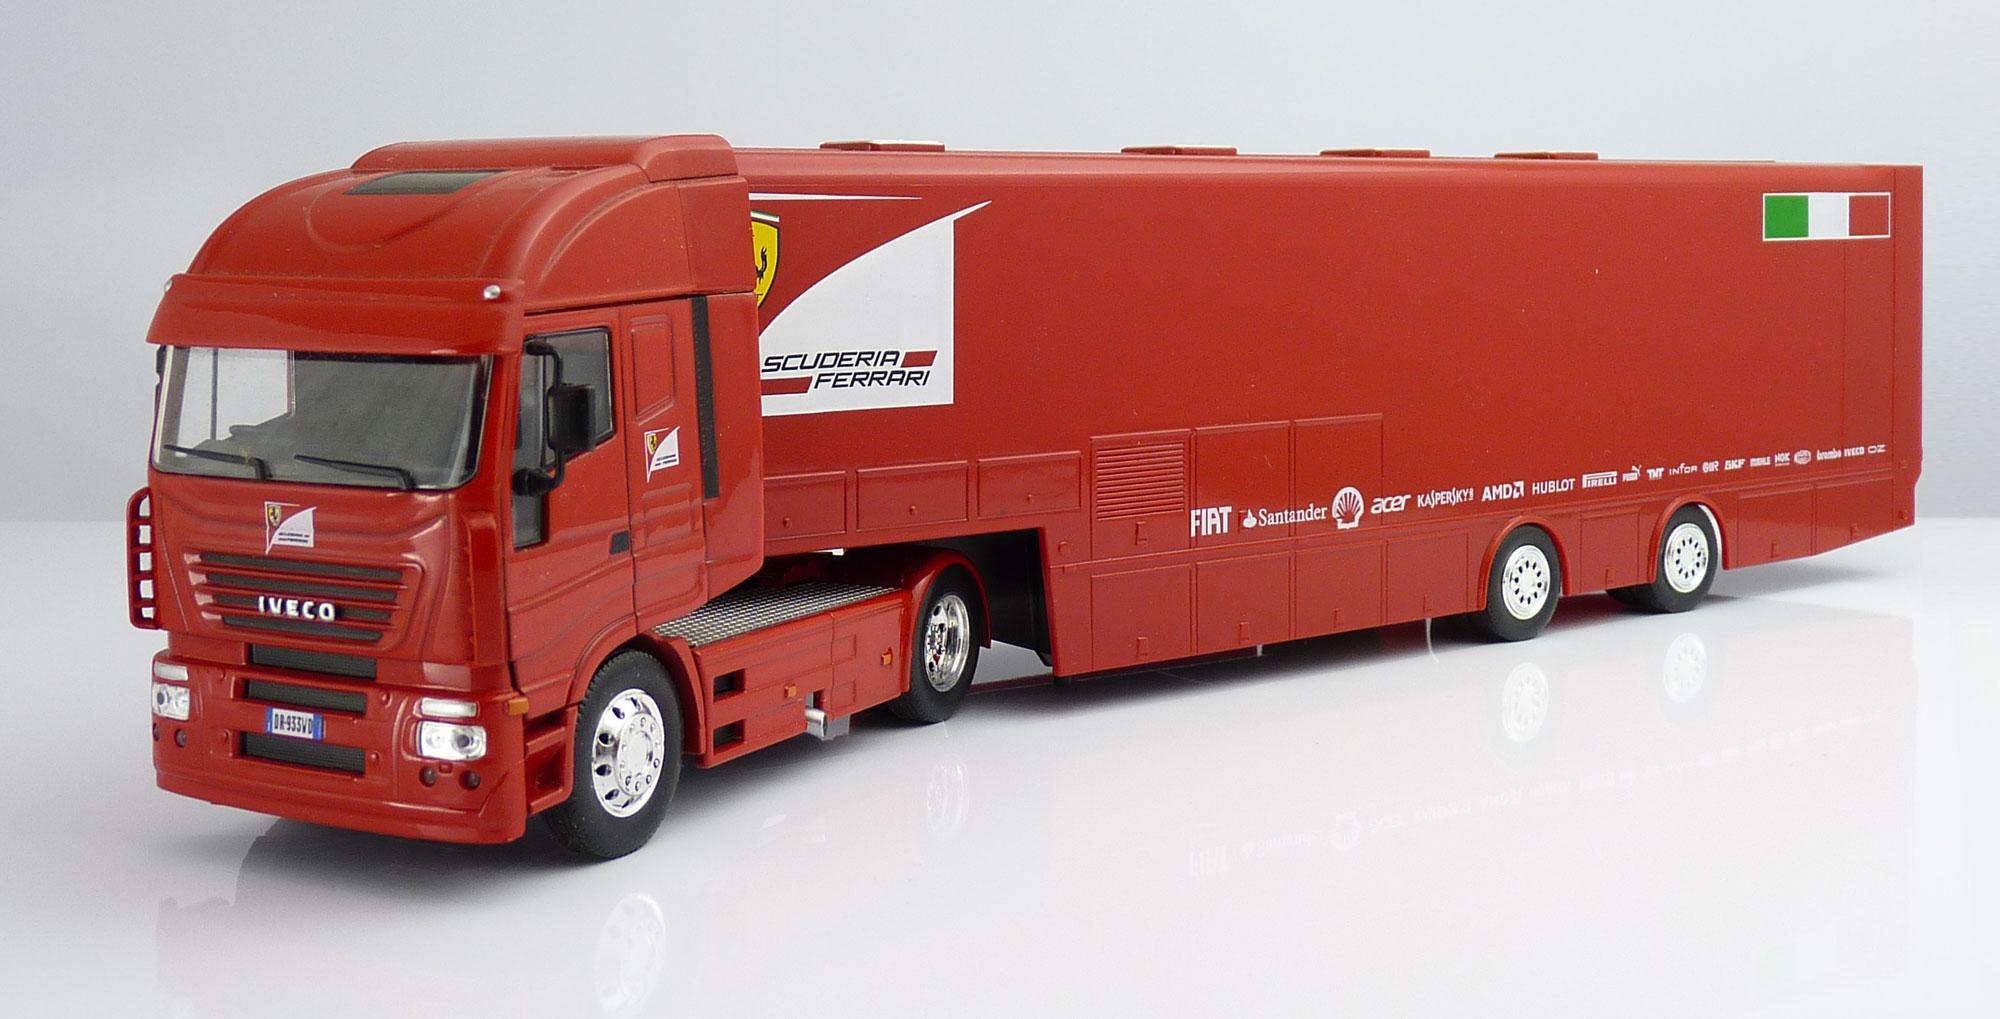 F1 Car Collection Ferrari Transporter Truck